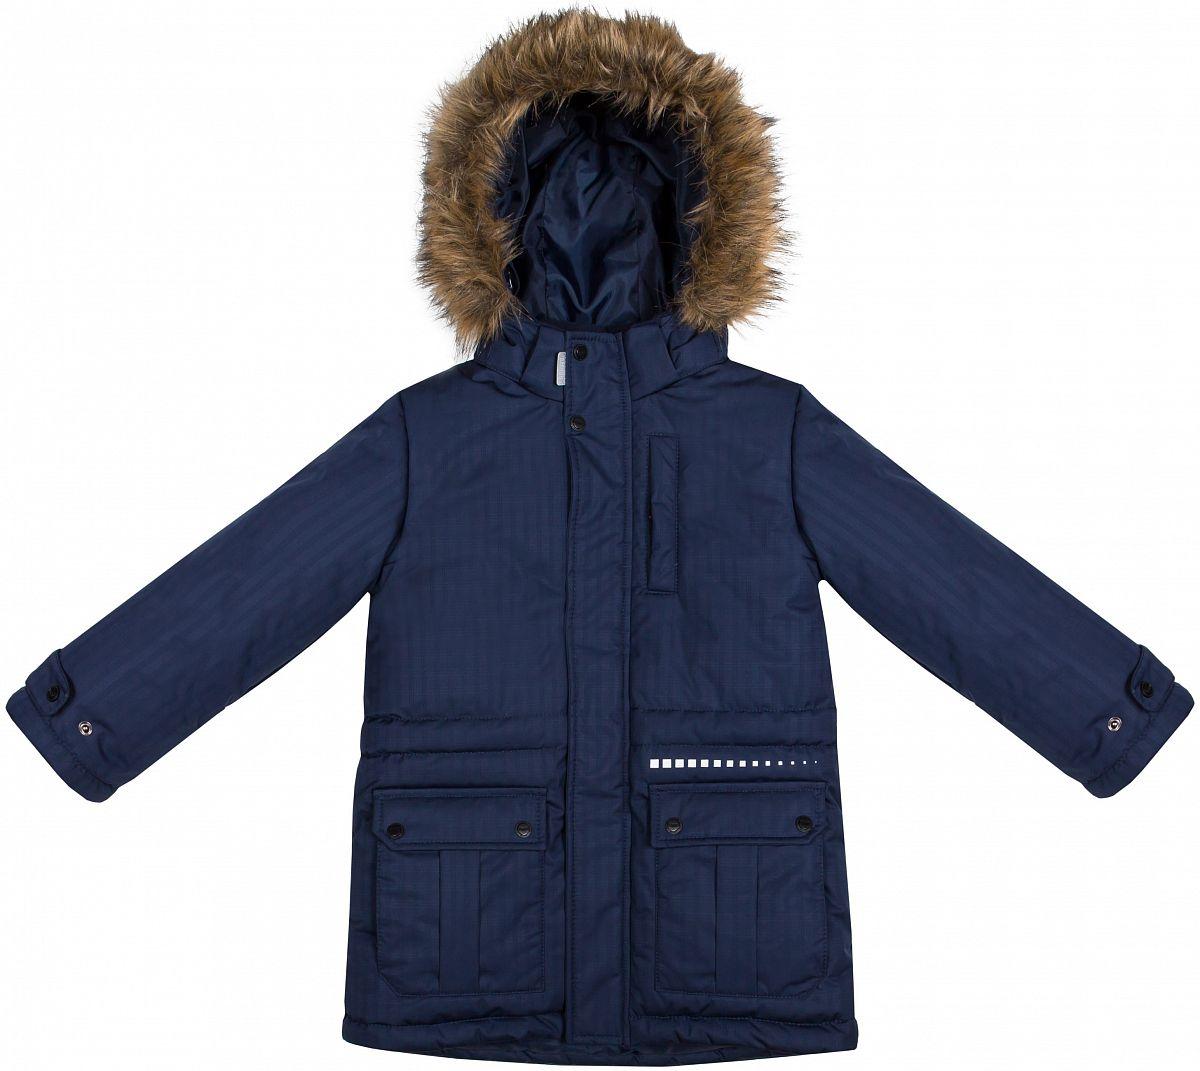 c5cc70d5247 Куртка для мальчика Barkito